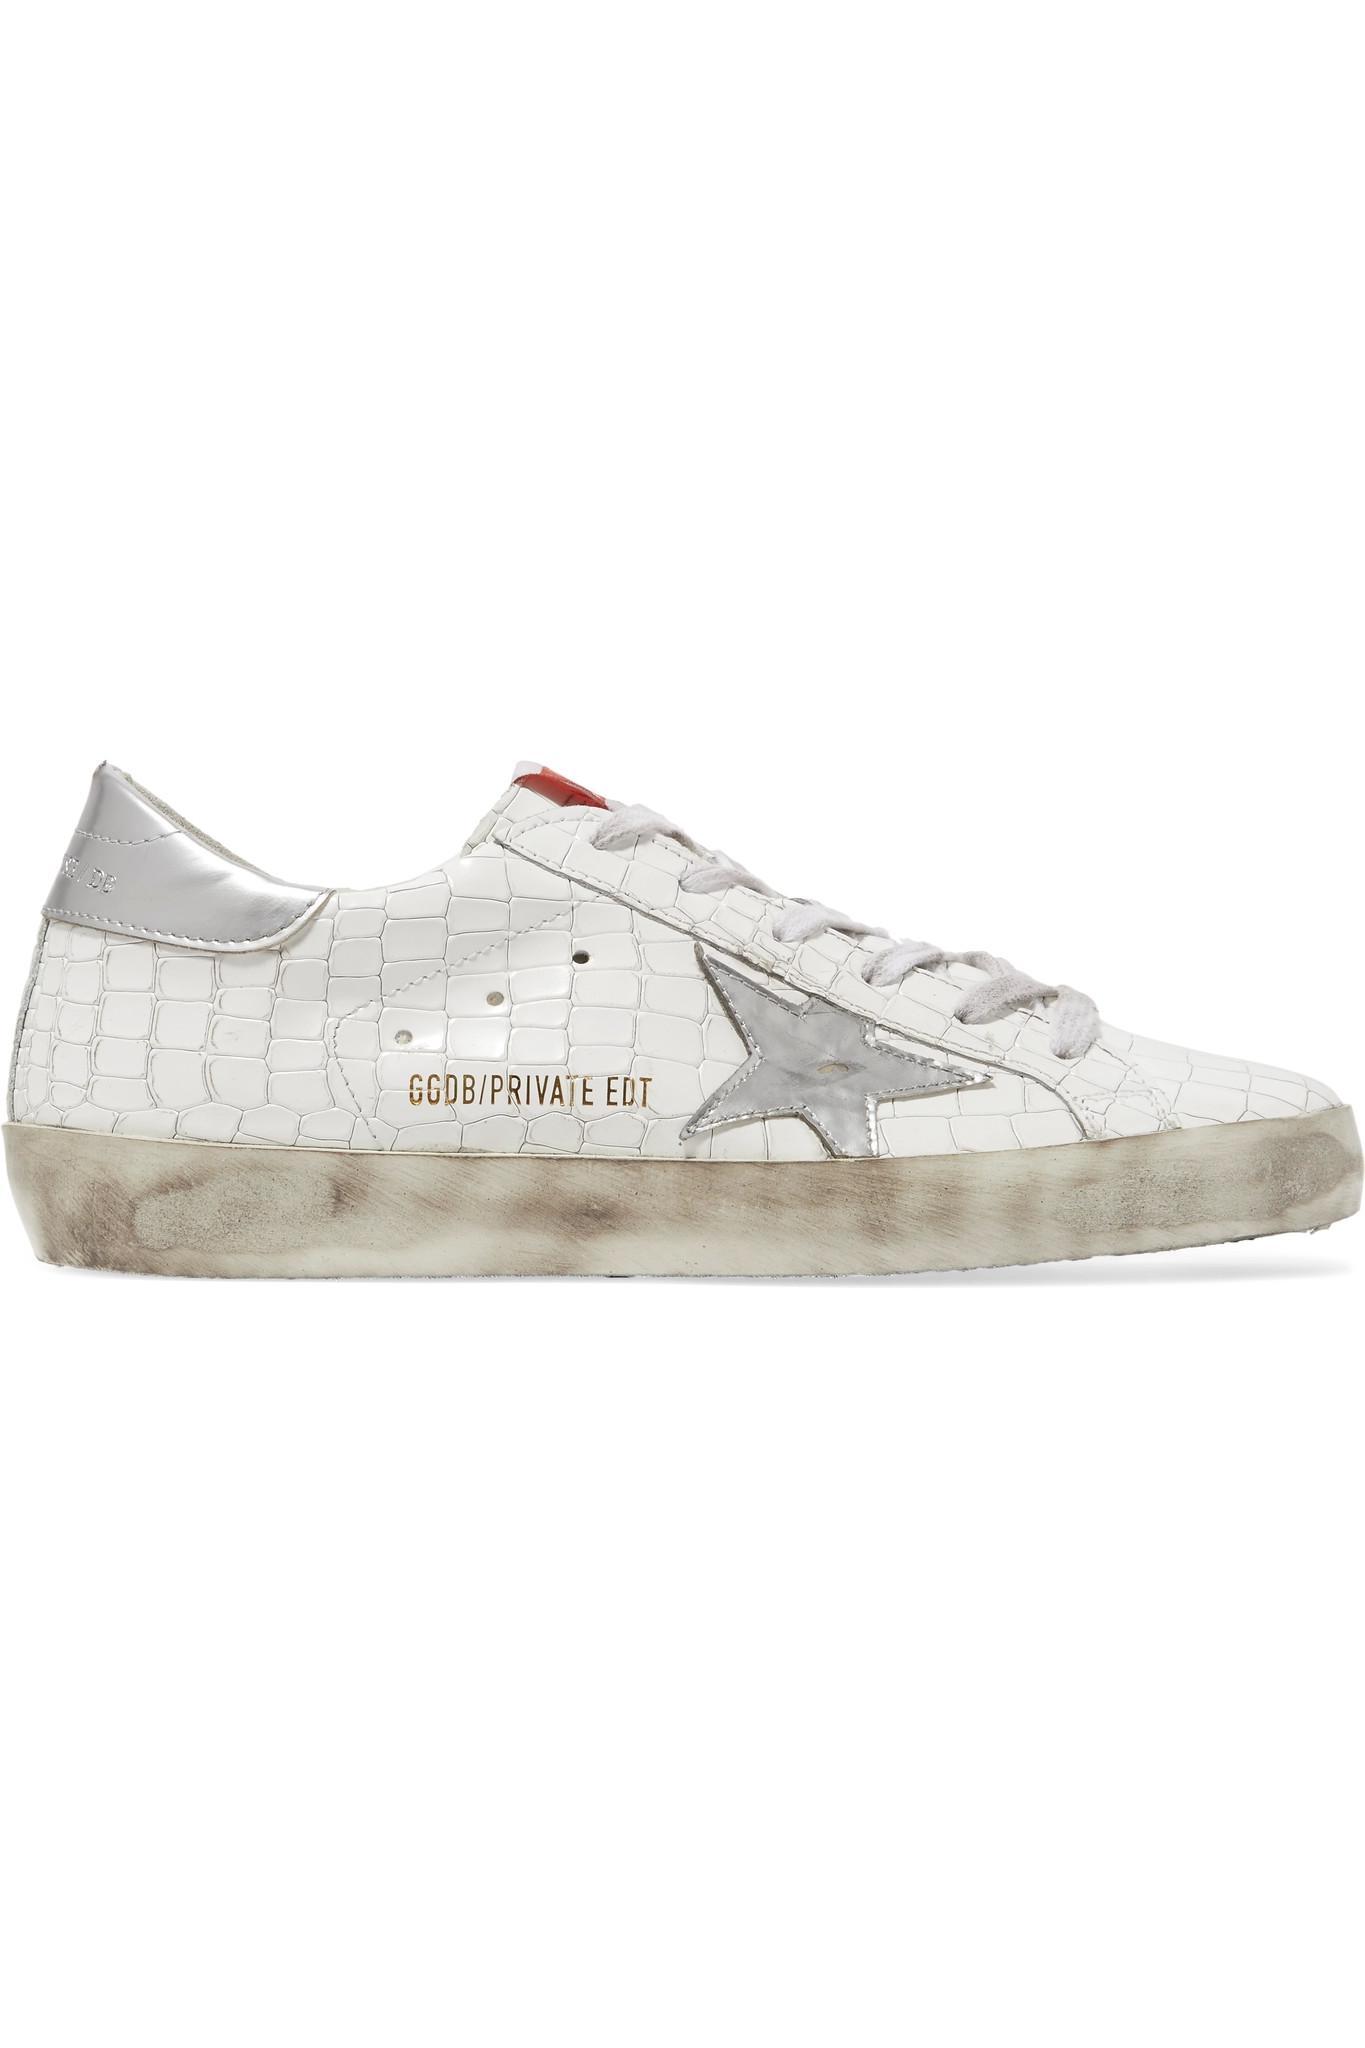 Golden Goose White Croc Superstar Sneakers NHoSyU99zX